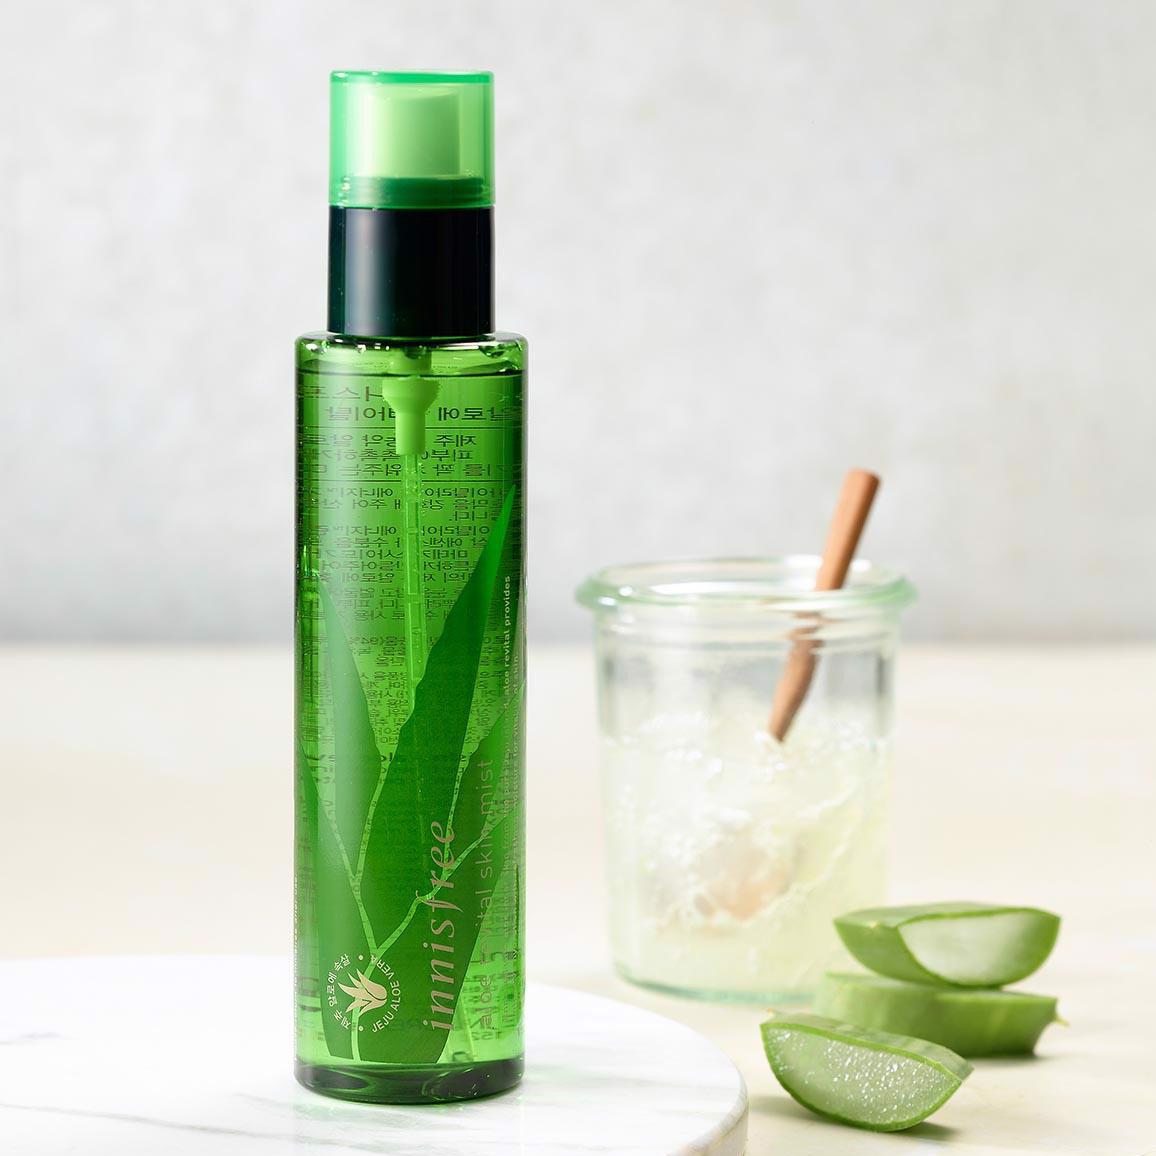 Xịt Khoáng Dưỡng Ẩm Innisfree Aloe Revital Skin Mist 120ml